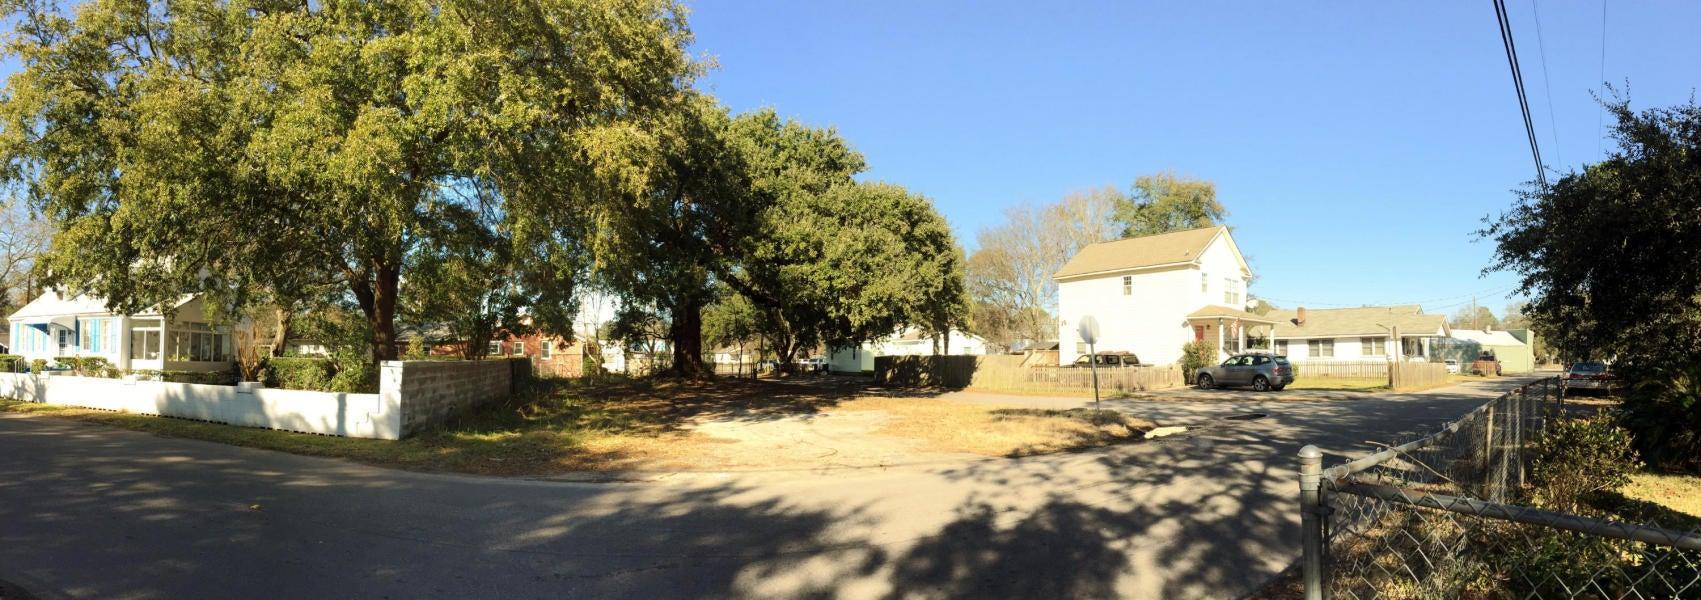 5  5TH Ave., Maryville Charleston, SC 29407